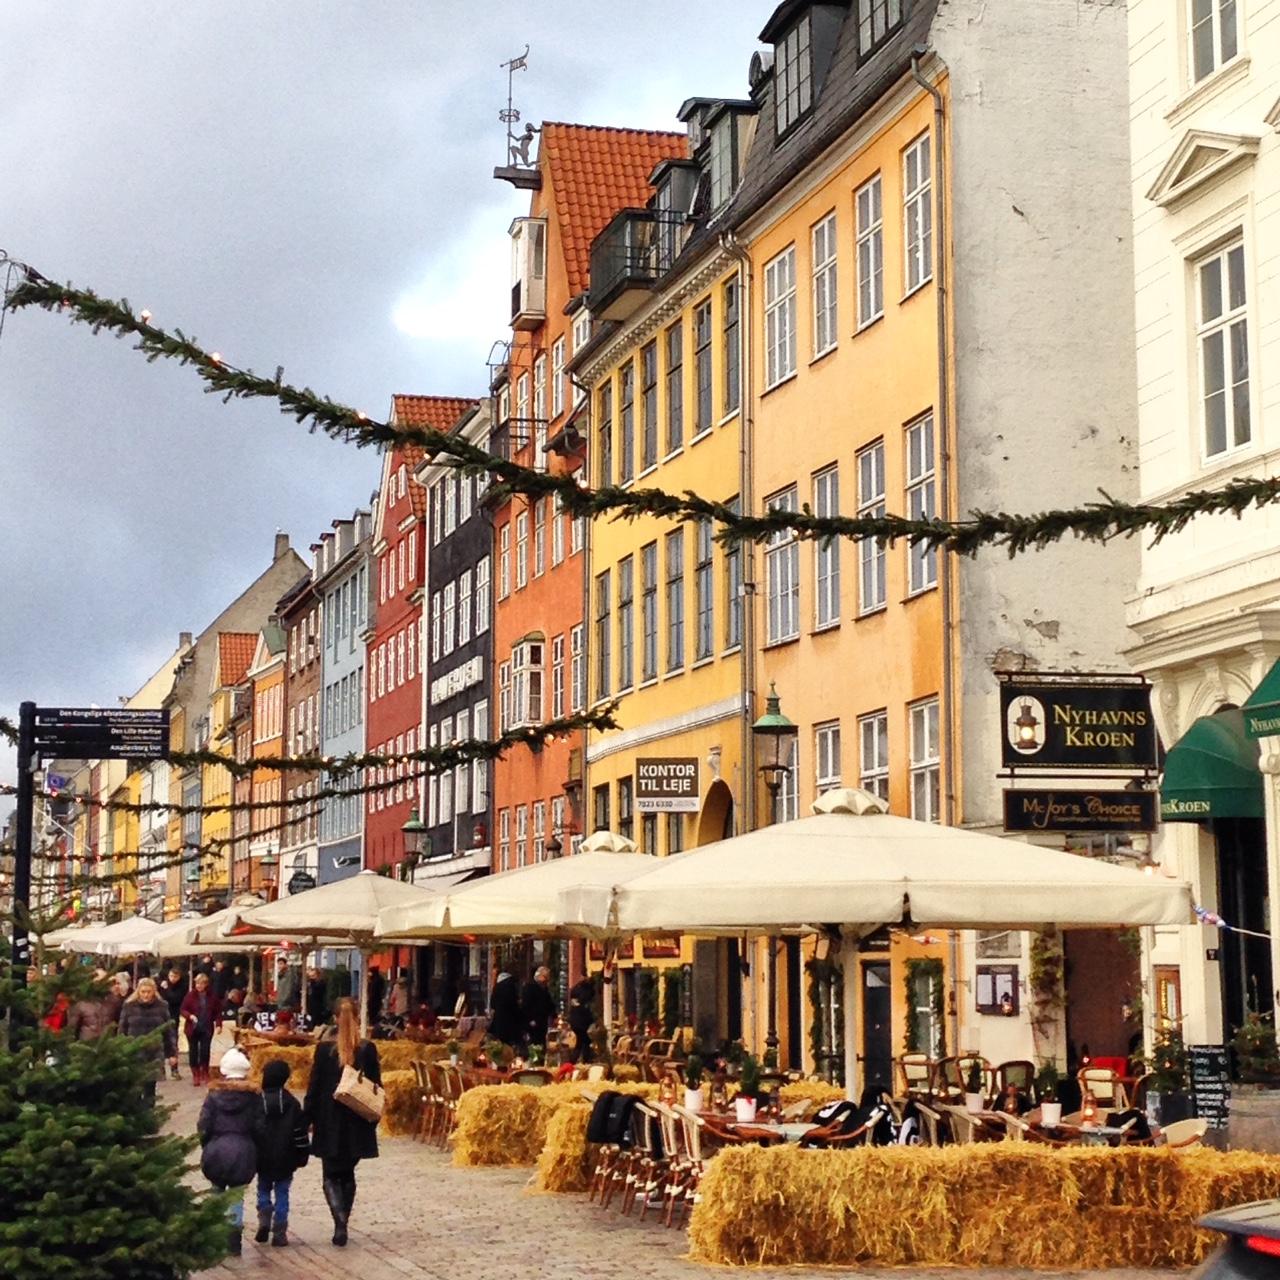 Une des rues principales de Copenhague